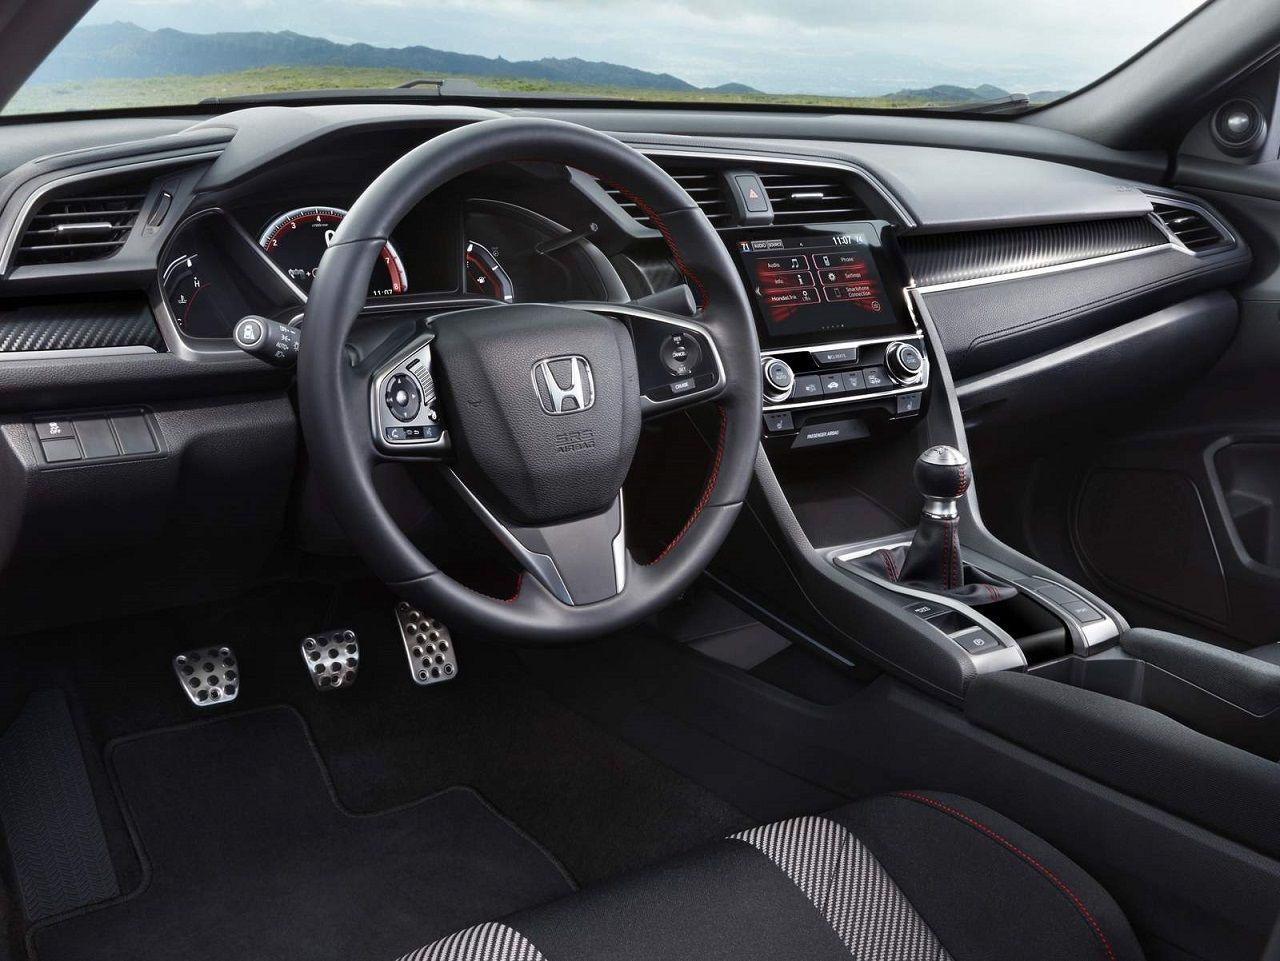 Honda Civic Si - Interior